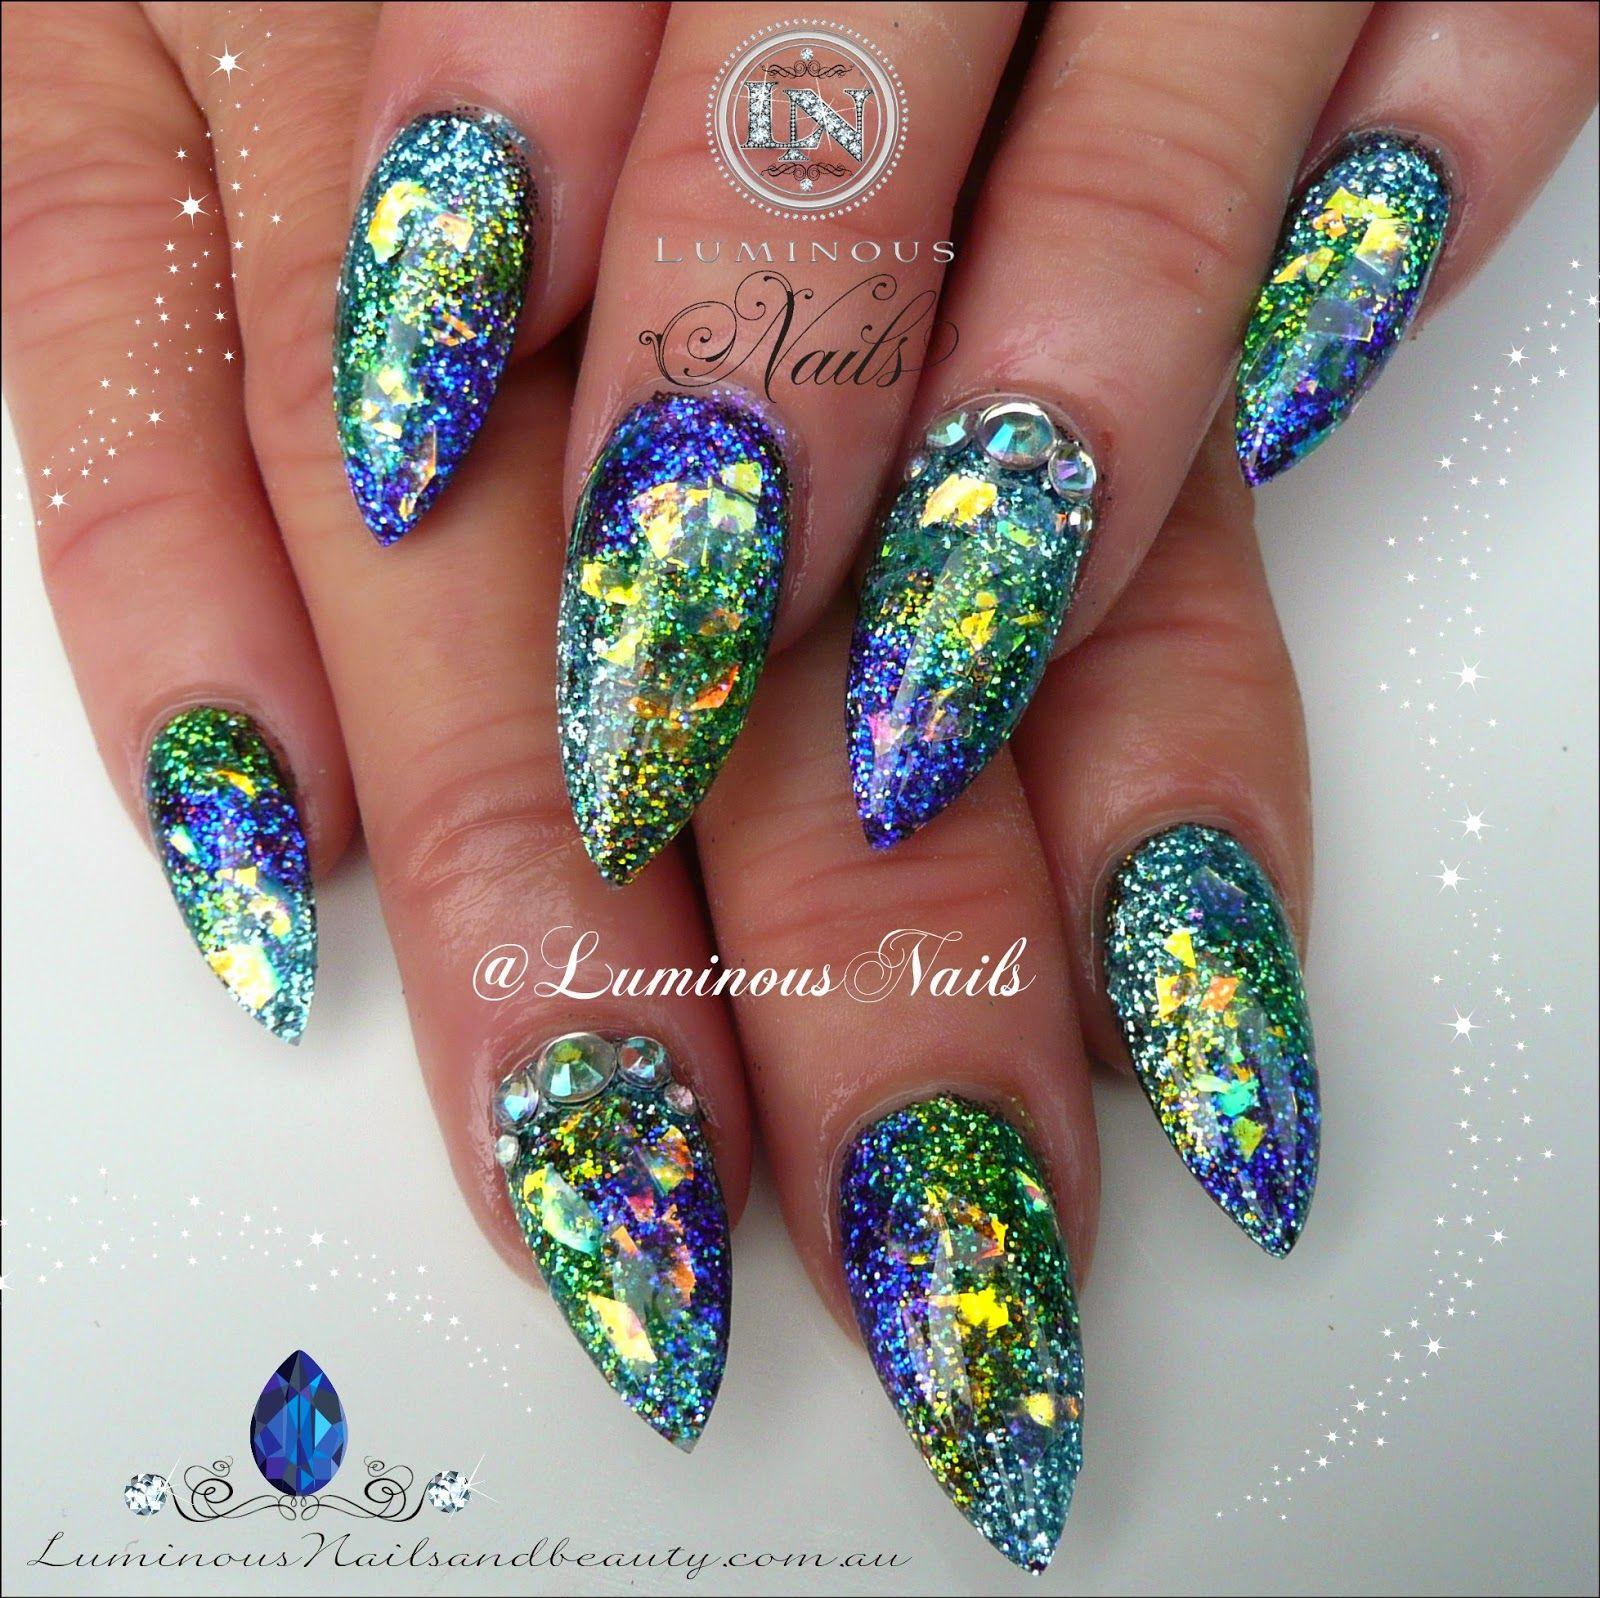 Opal Glitter Nail Polish: Luminous Nails: Glittery Opal Effect Nails!..Glittery Opal